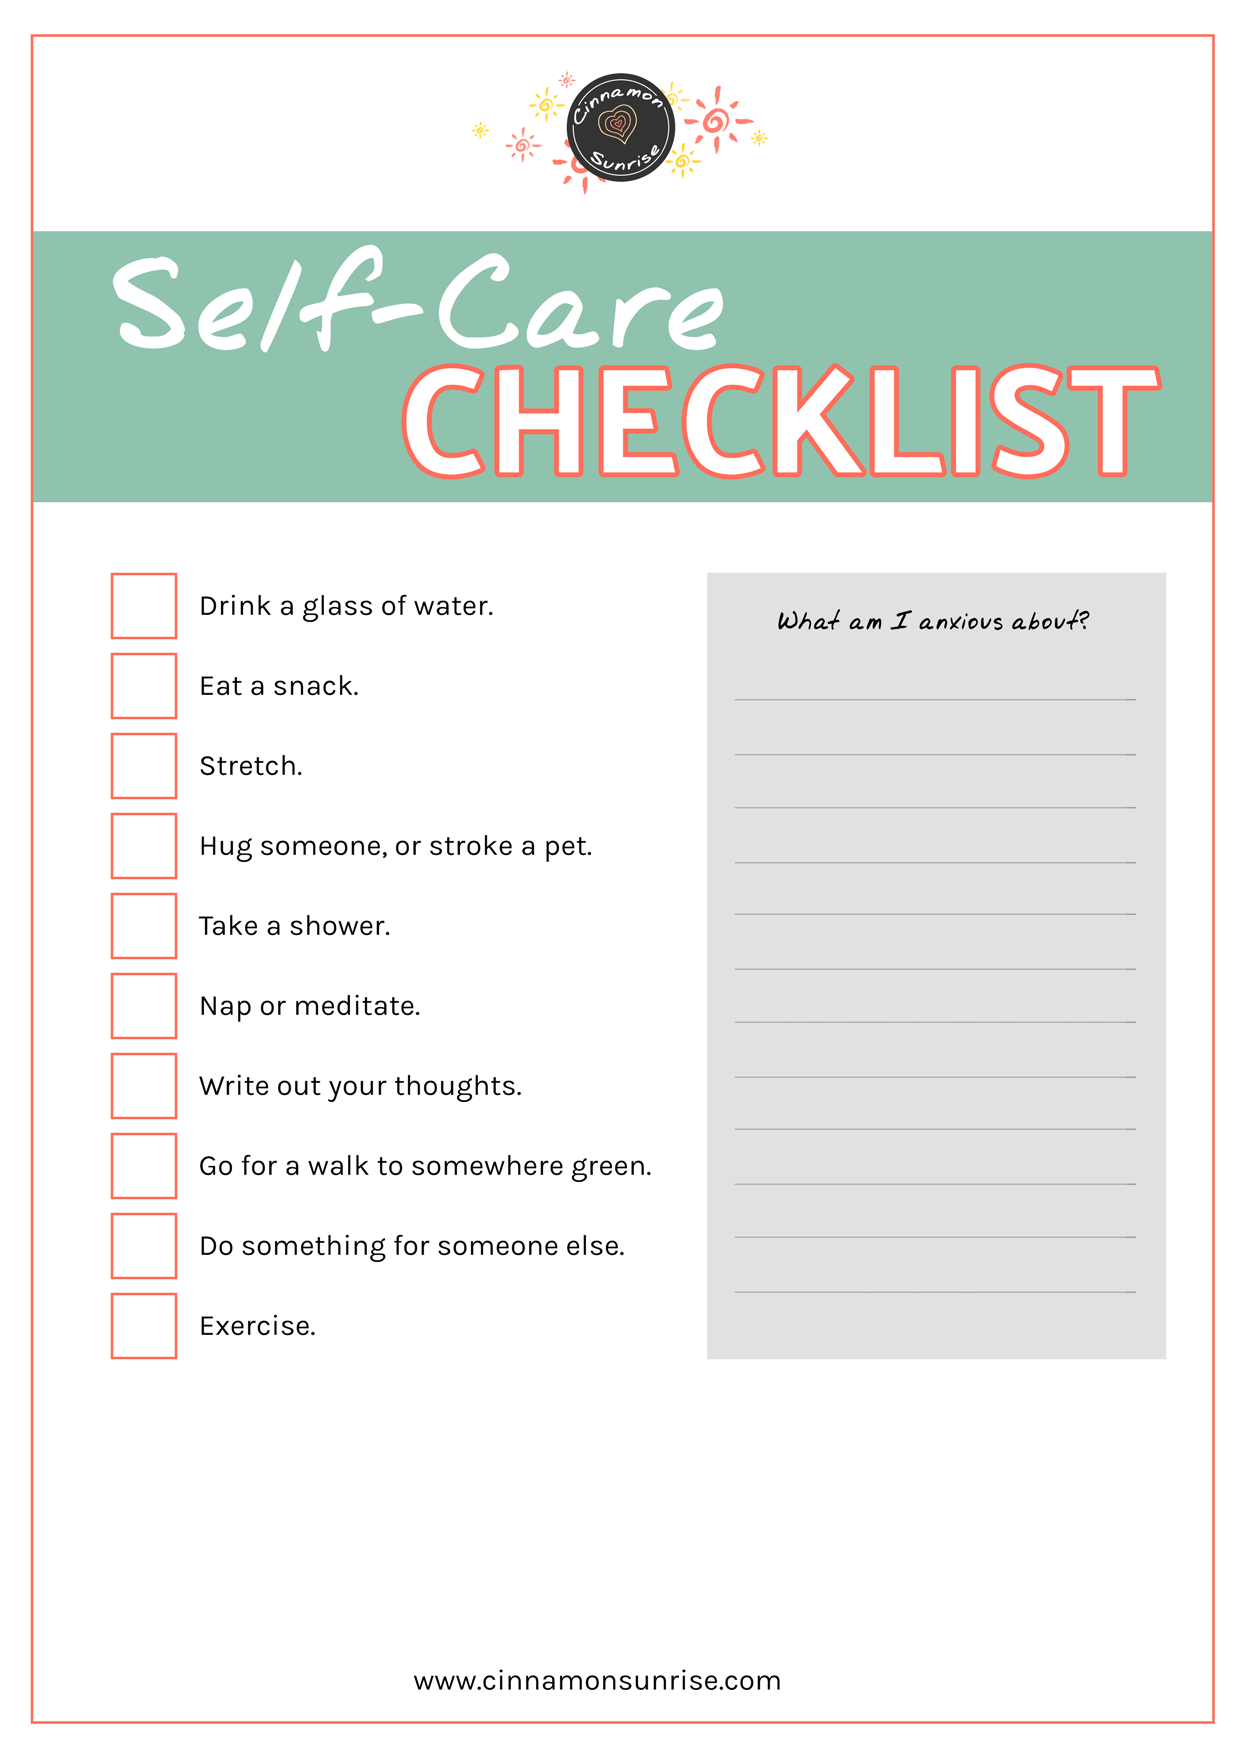 Massif image regarding self care printable